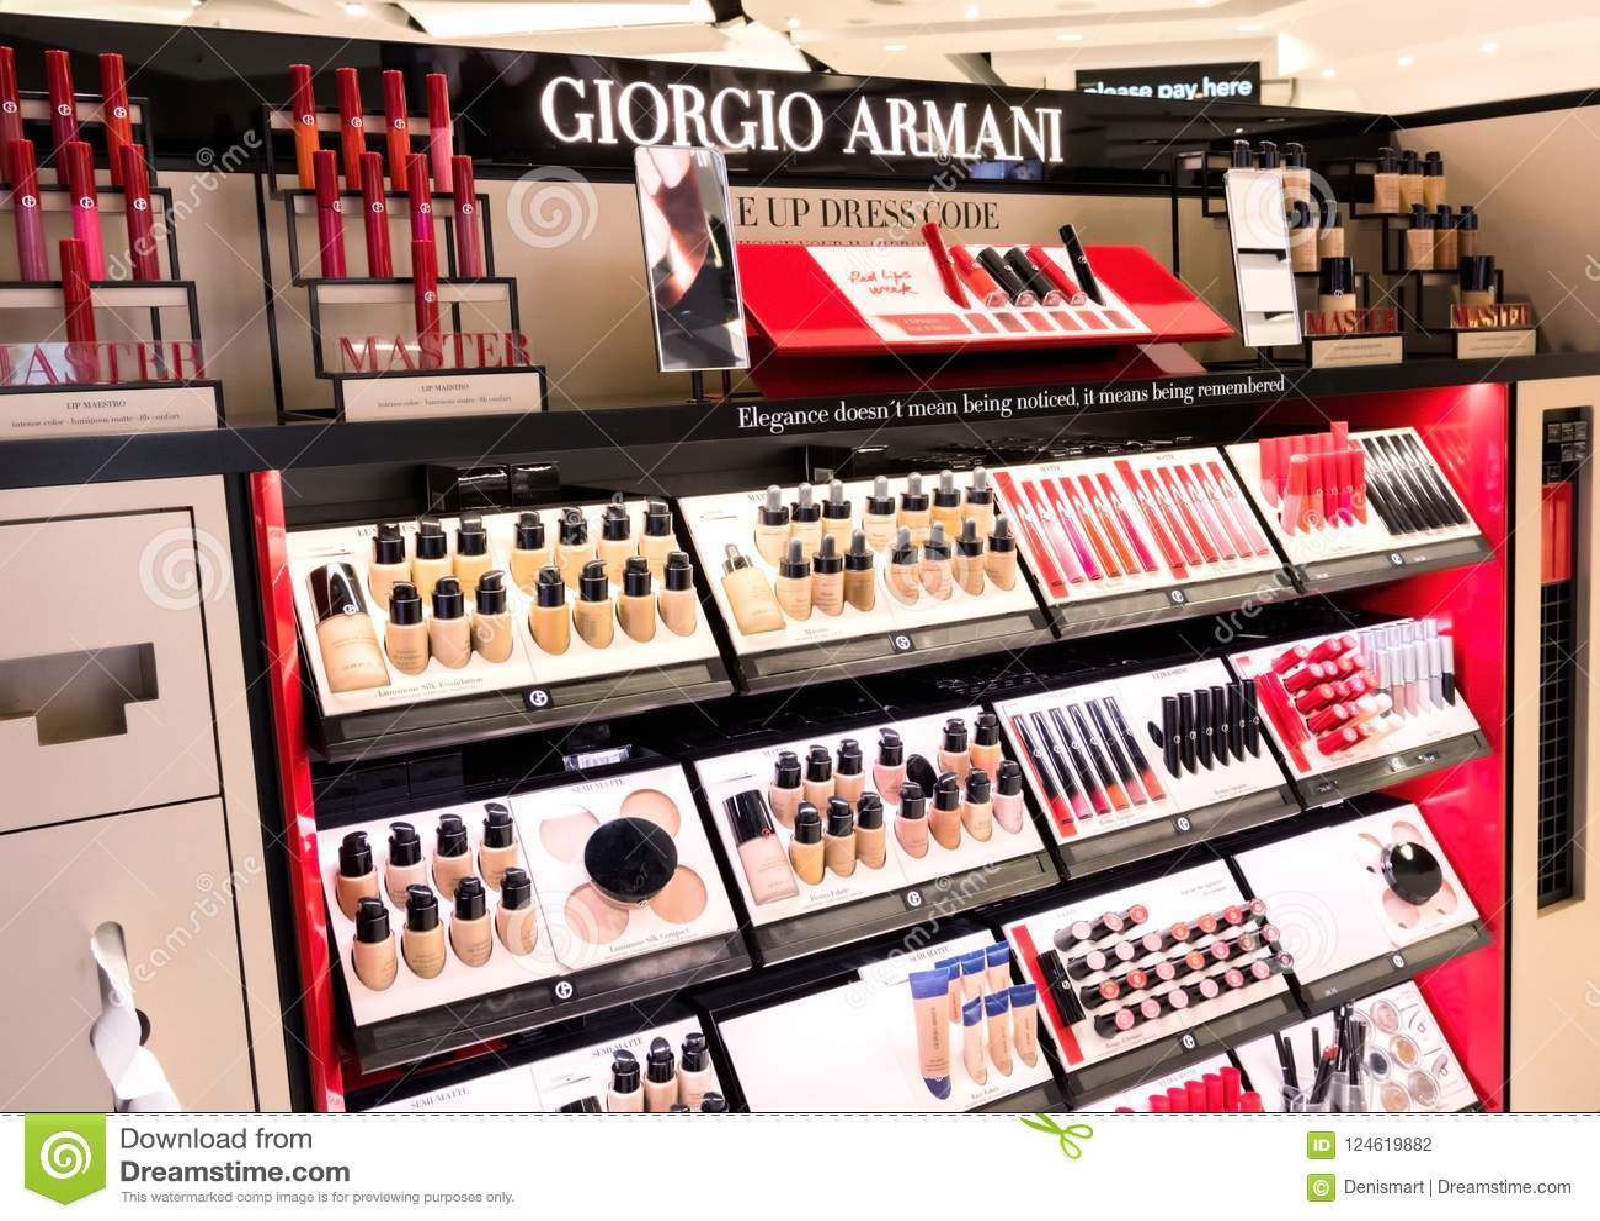 London Uk August 31 2018 Giorgio Armani Lipstick And Cosmetic